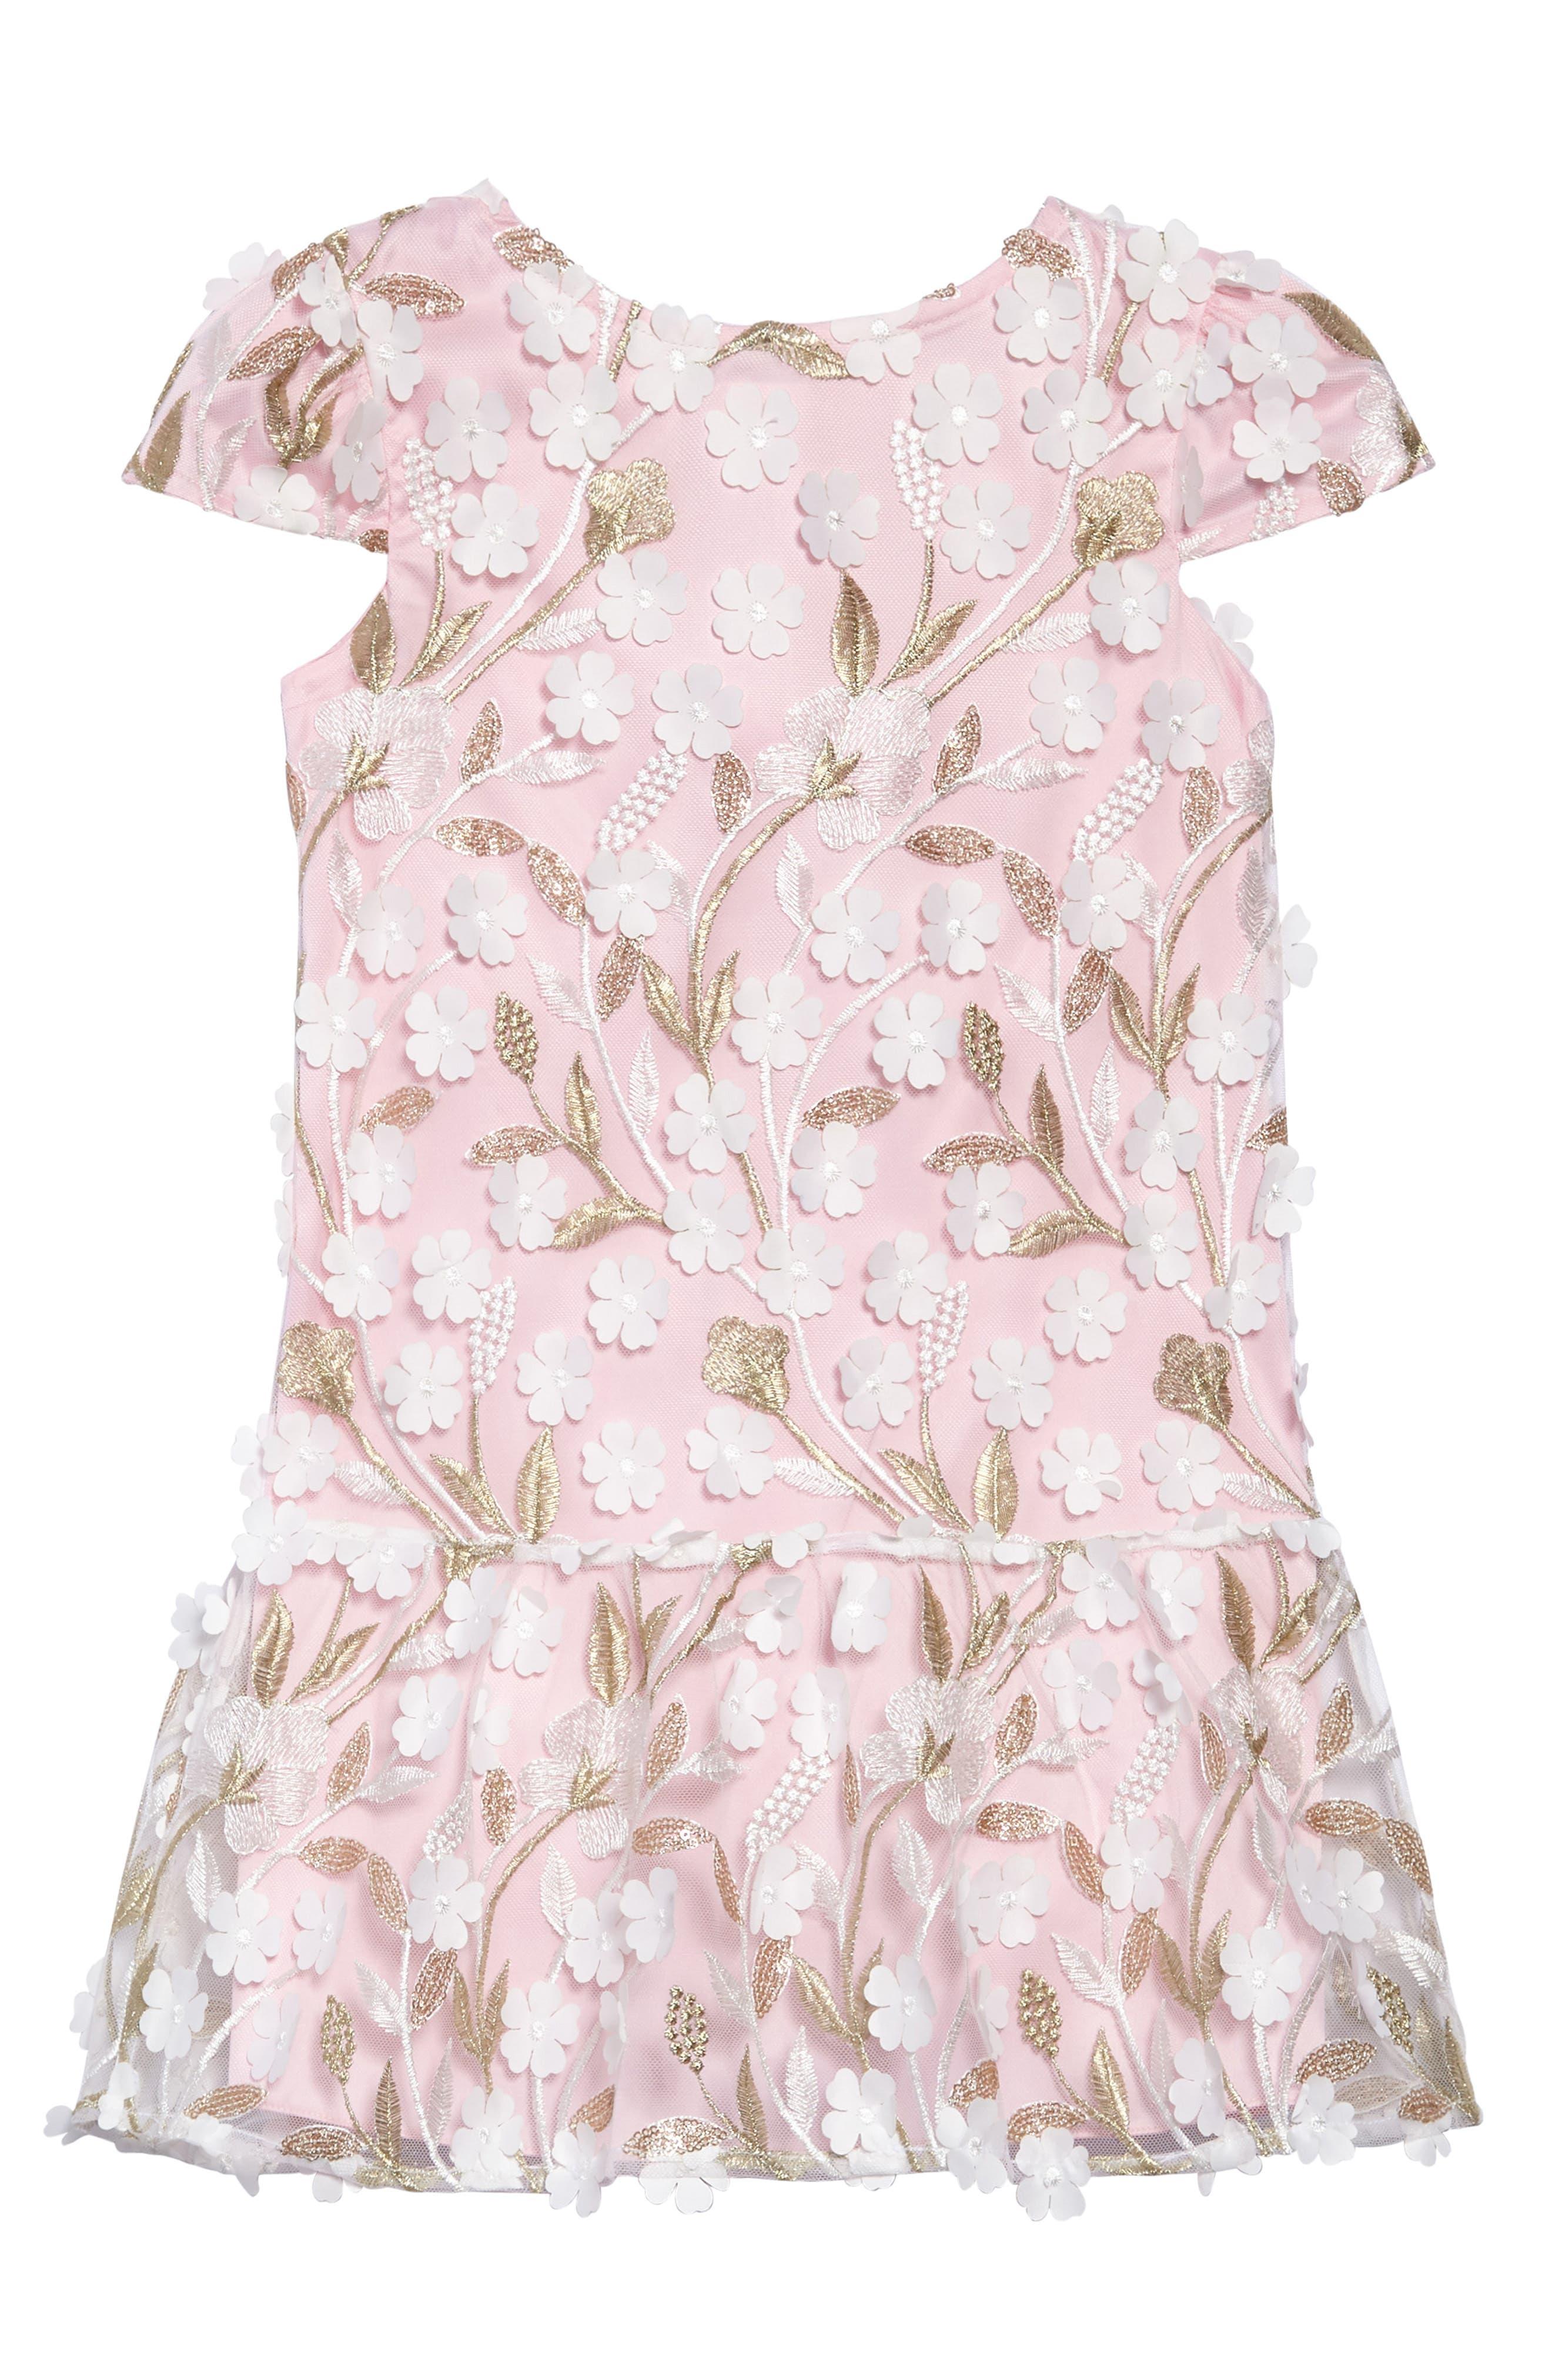 Floral Drop Waist Dress,                             Main thumbnail 1, color,                             Pink